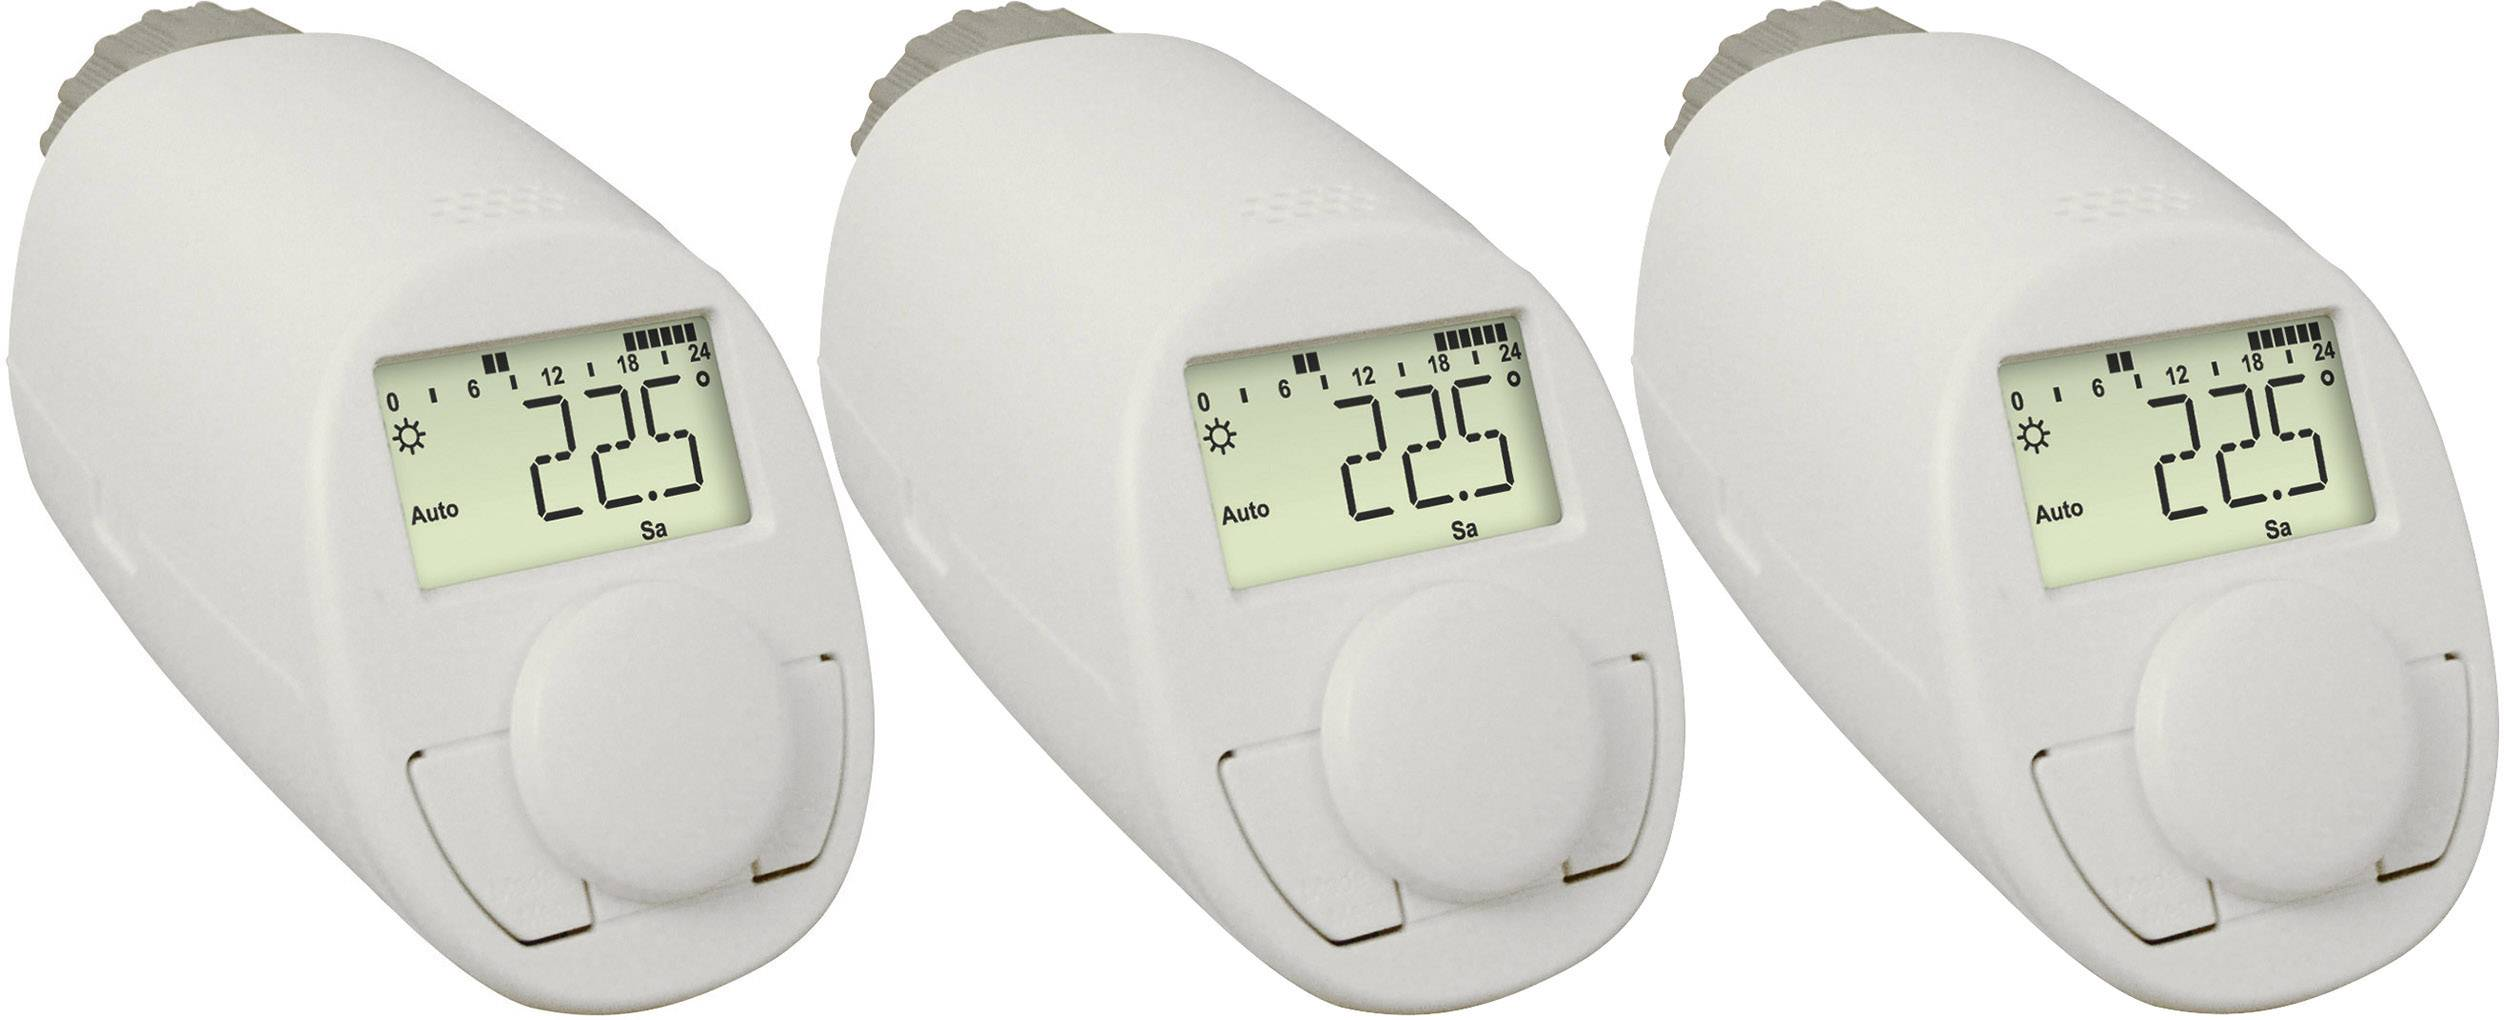 Programovatelná termostatická hlavice eqiva N, 5 až 29.5 °C, sada 3 ks